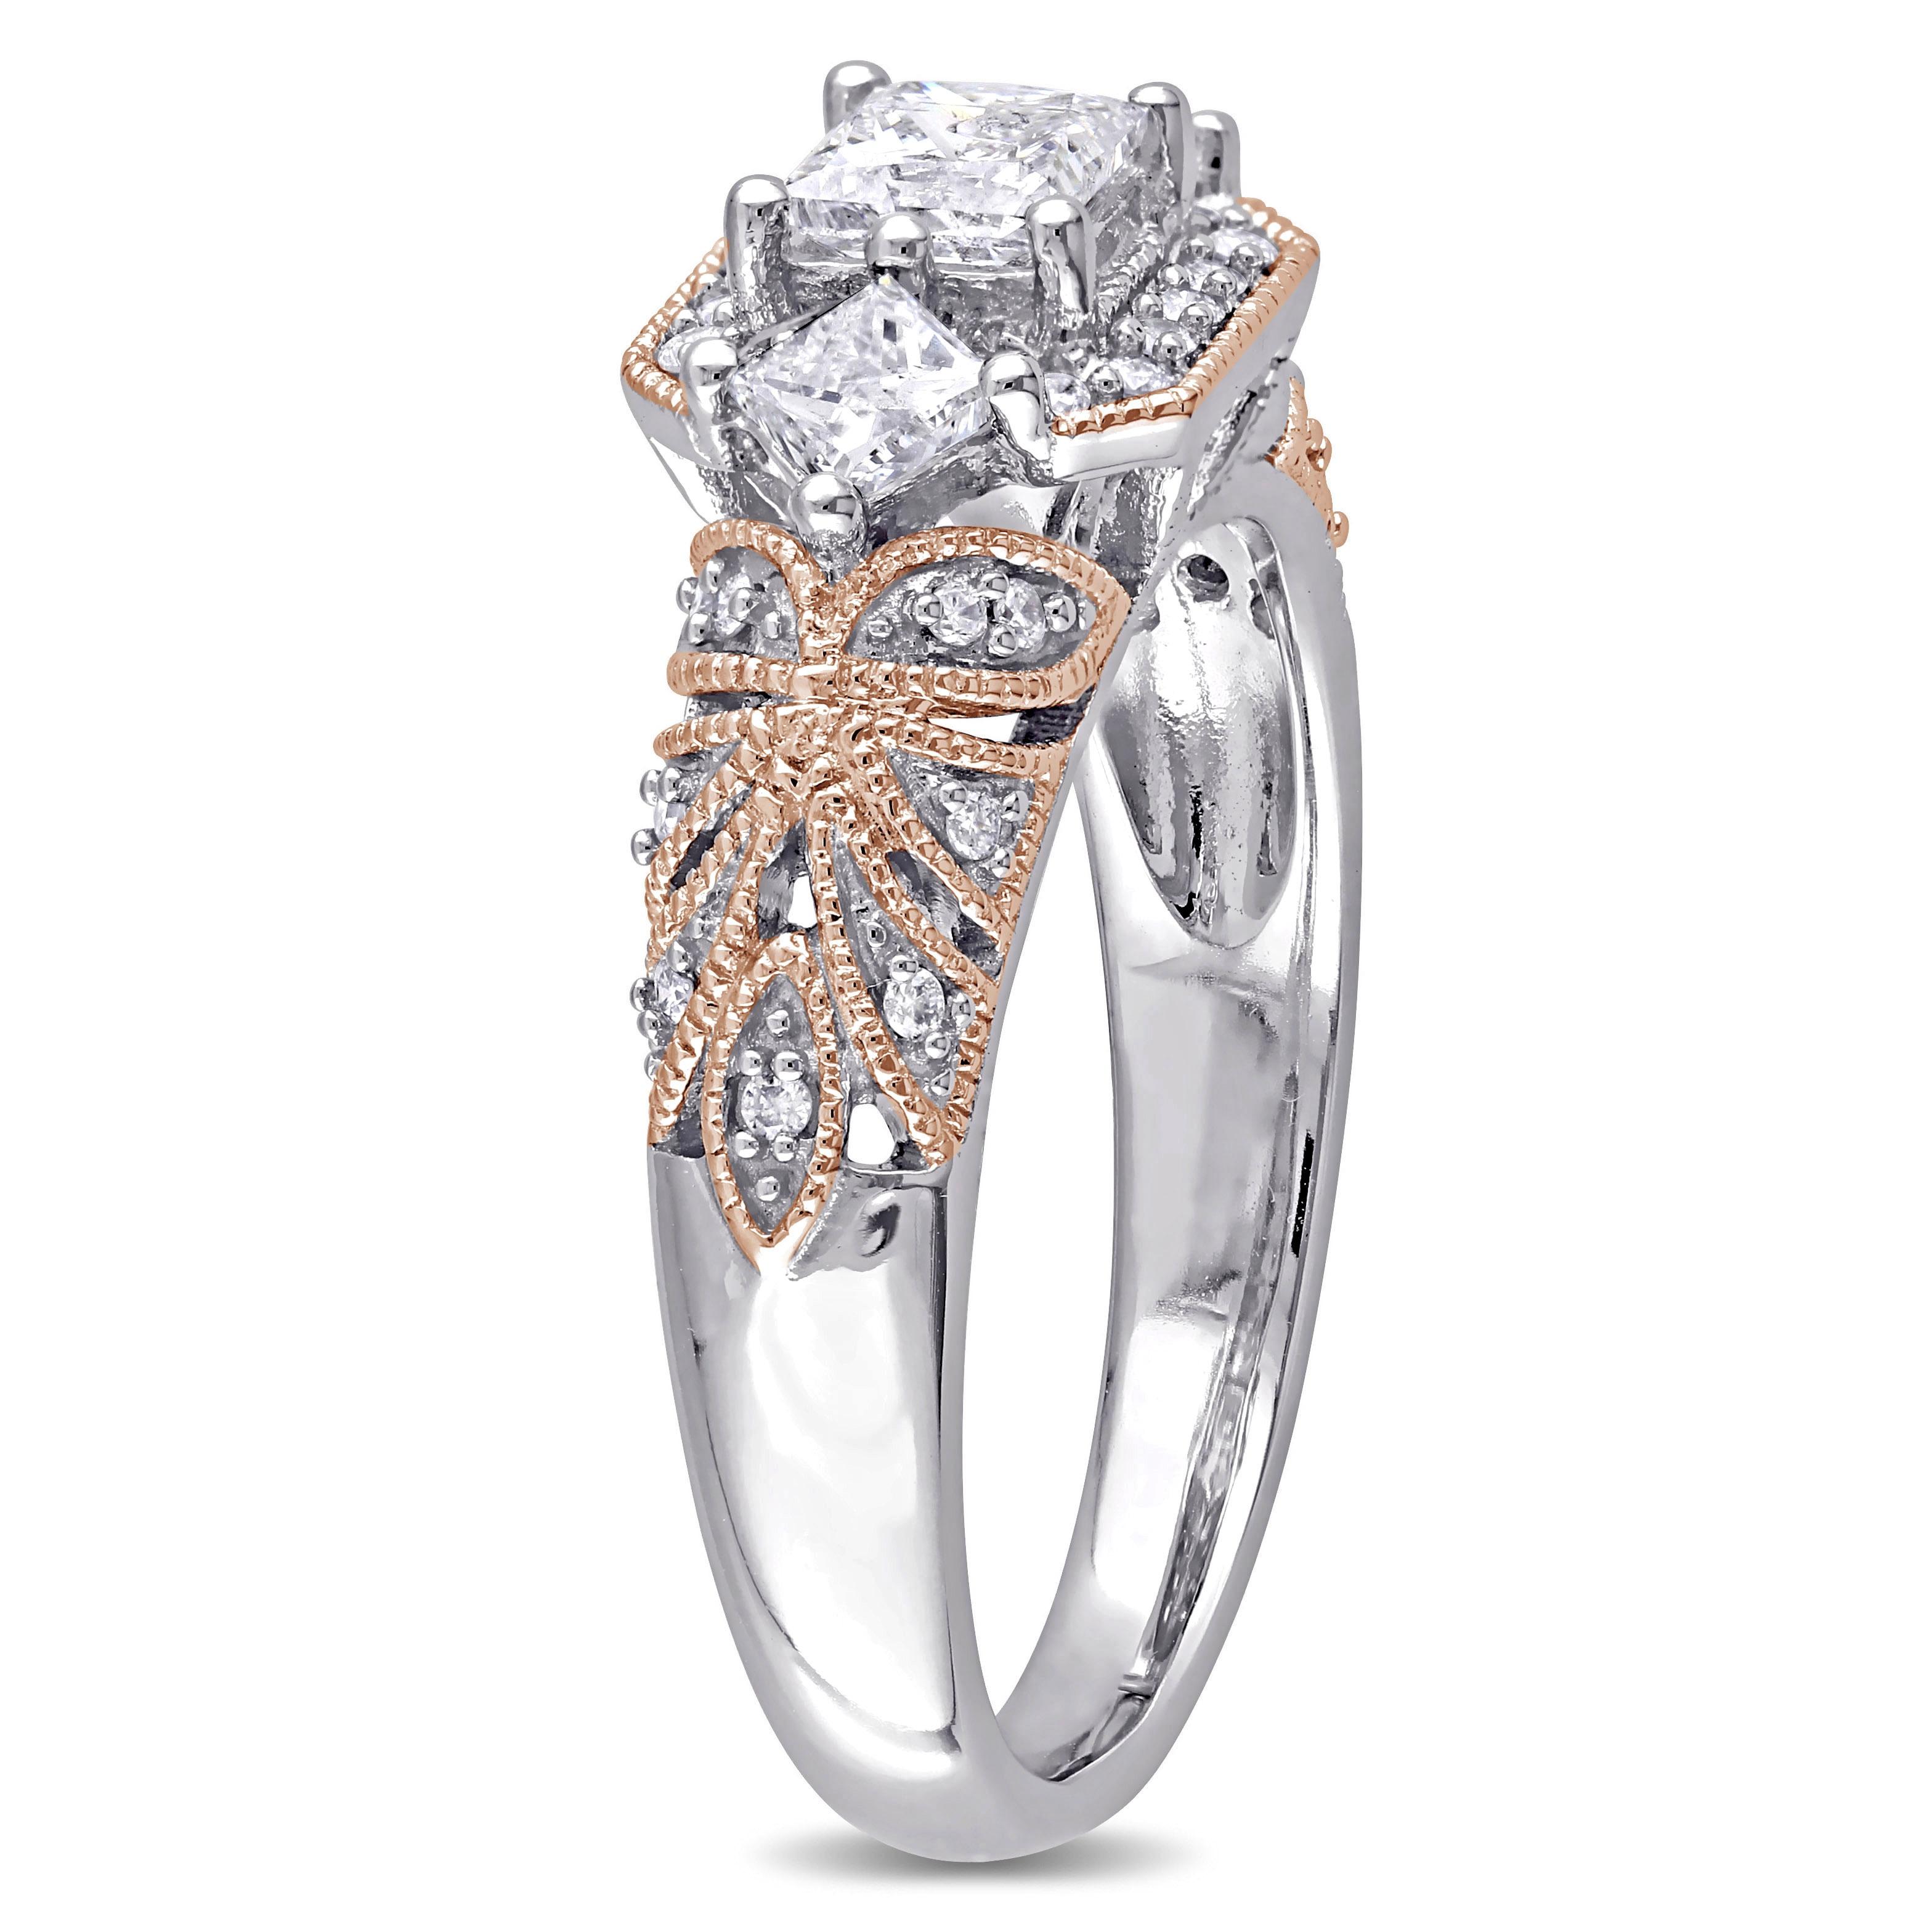 Size-5.25 Diamond Wedding Band in 10K White Gold 1//6 cttw, G-H,I2-I3